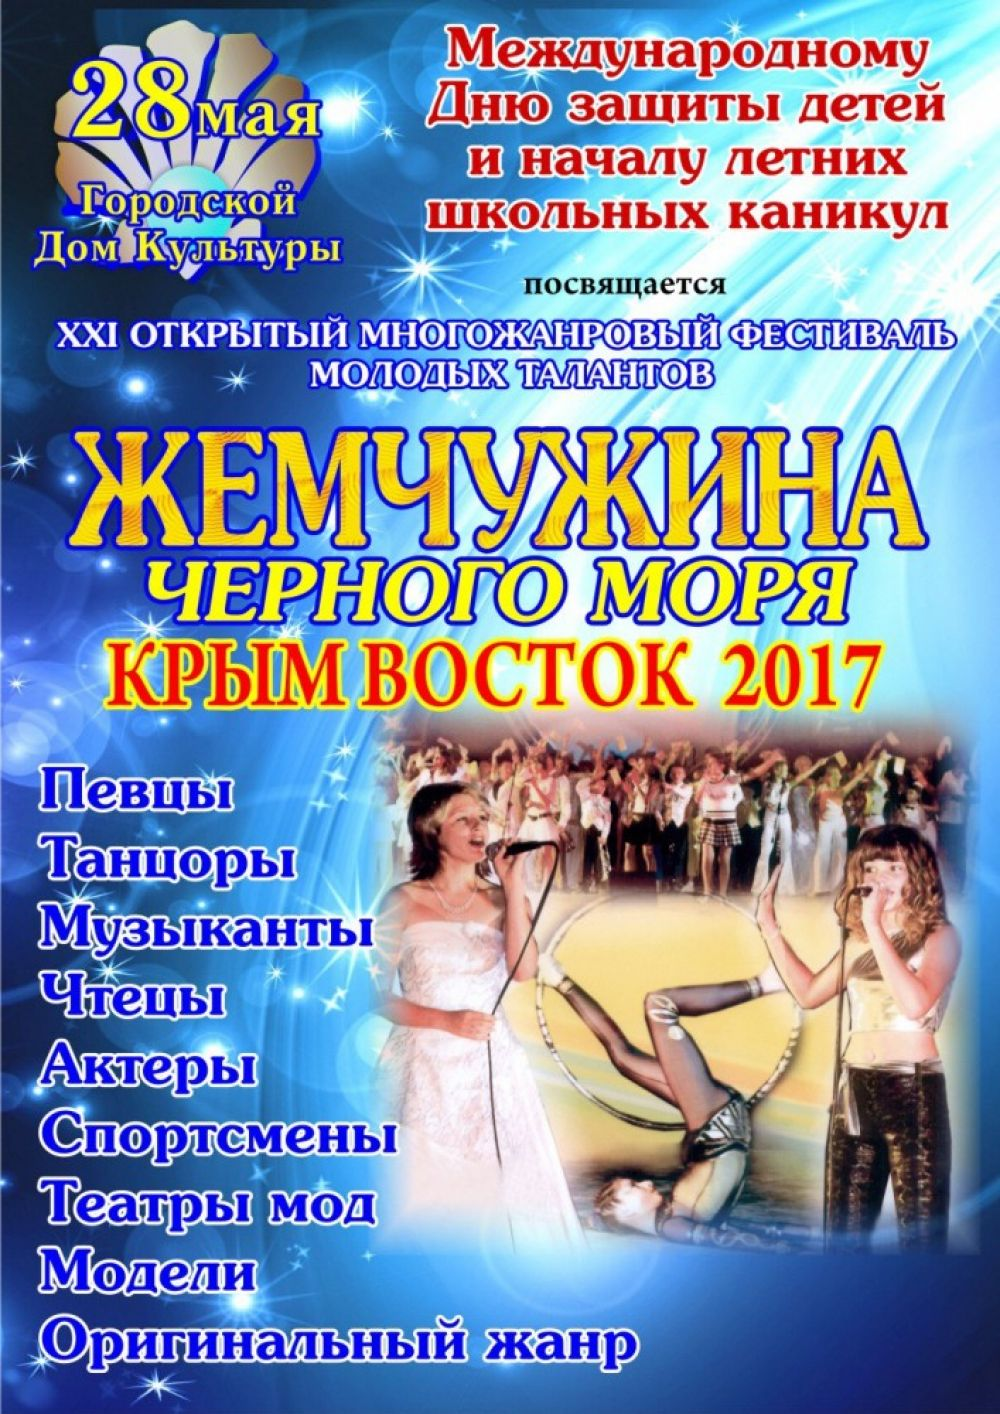 Афиша мероприятий Феодосийского городского Дома культуры